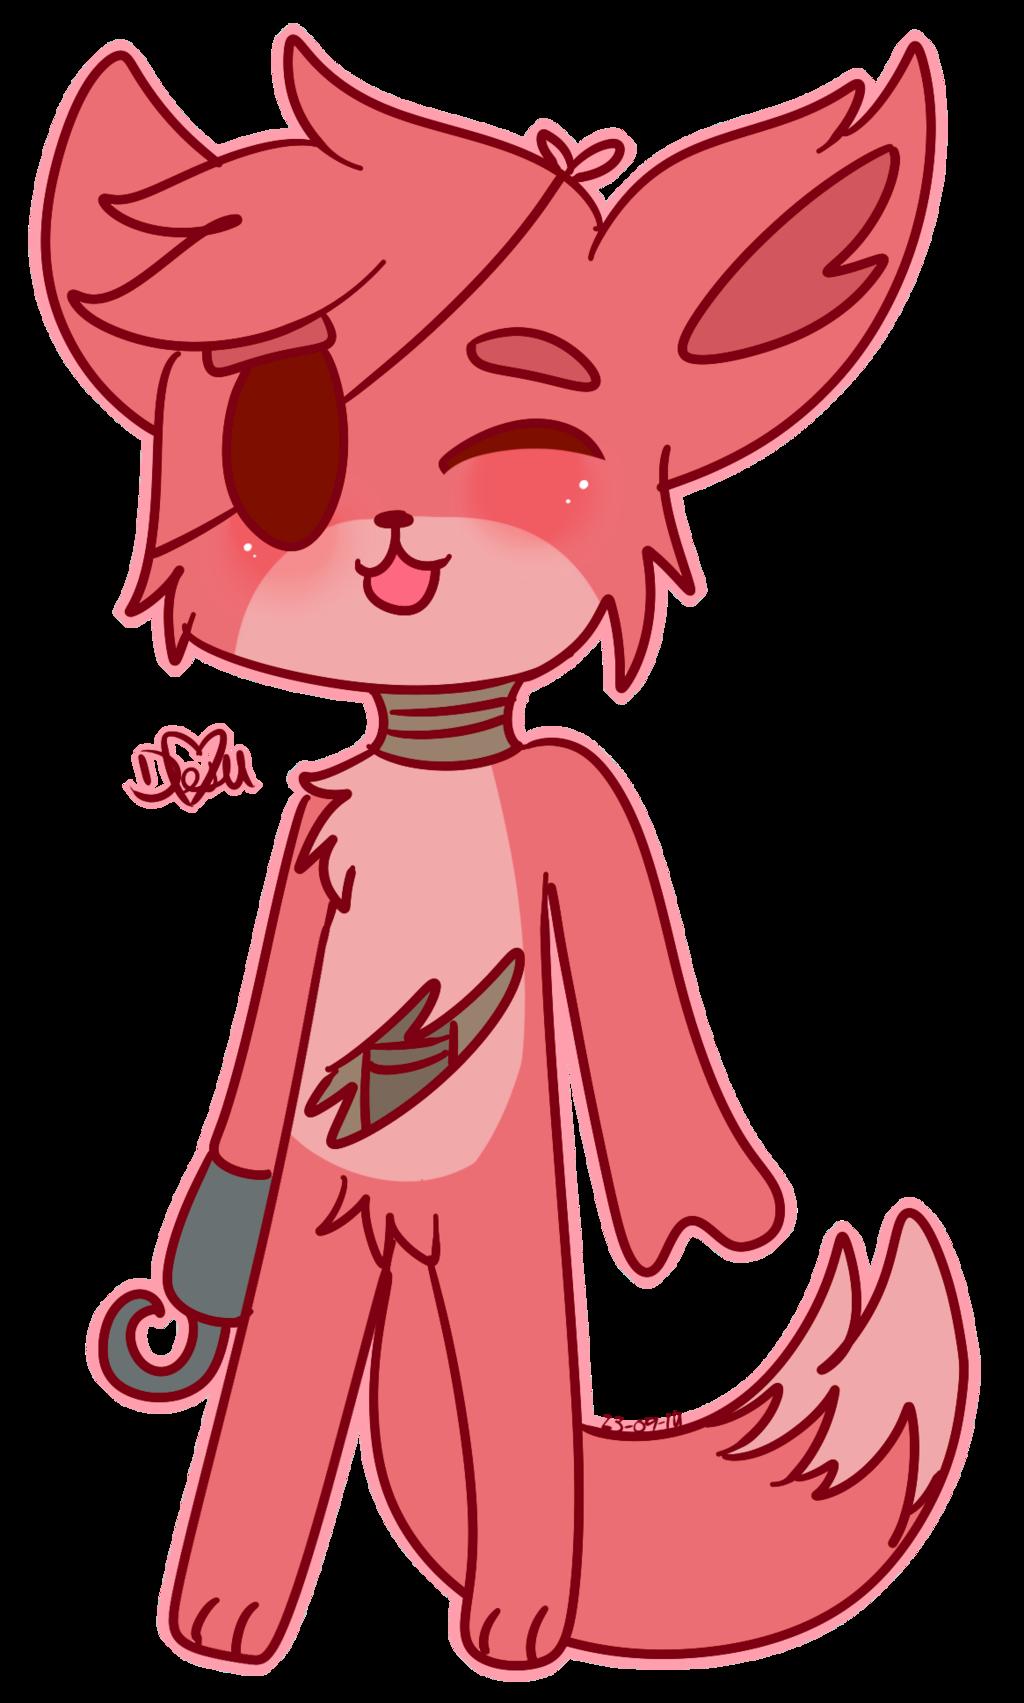 Kawaii clipart soda. Foxy by chicapitufa deviantart